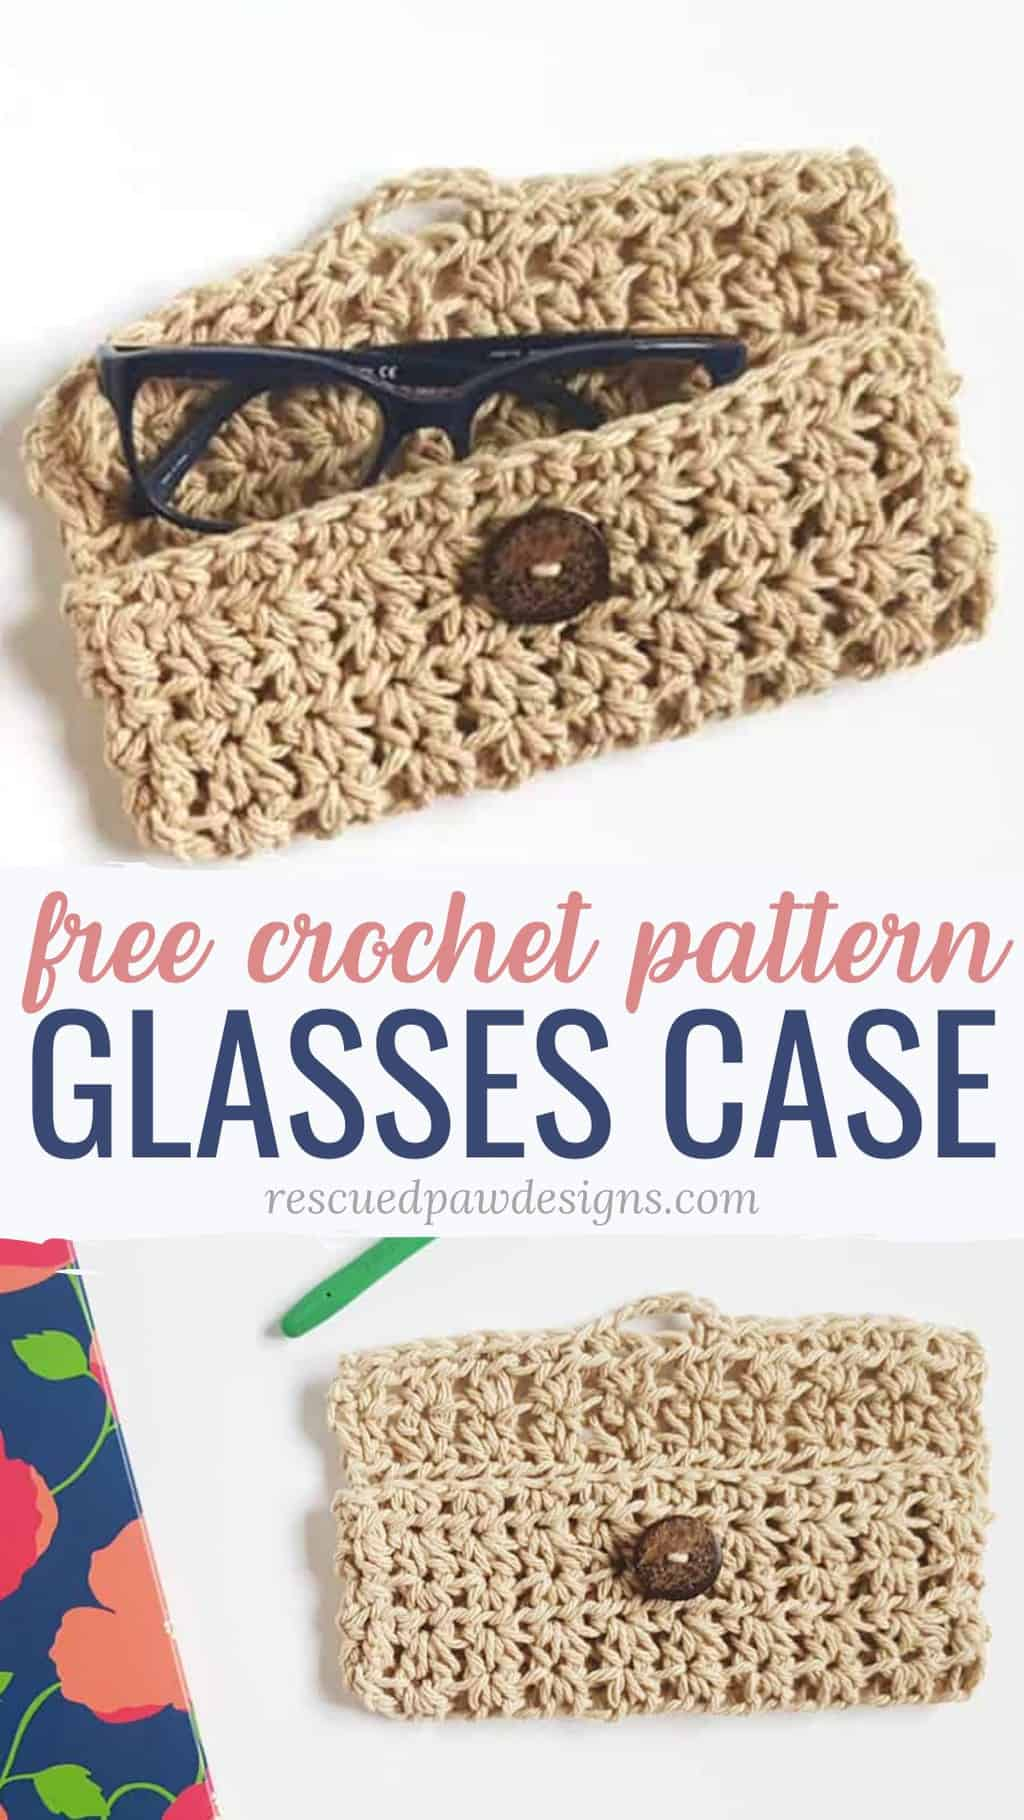 Glasses Case Crochet Pattern